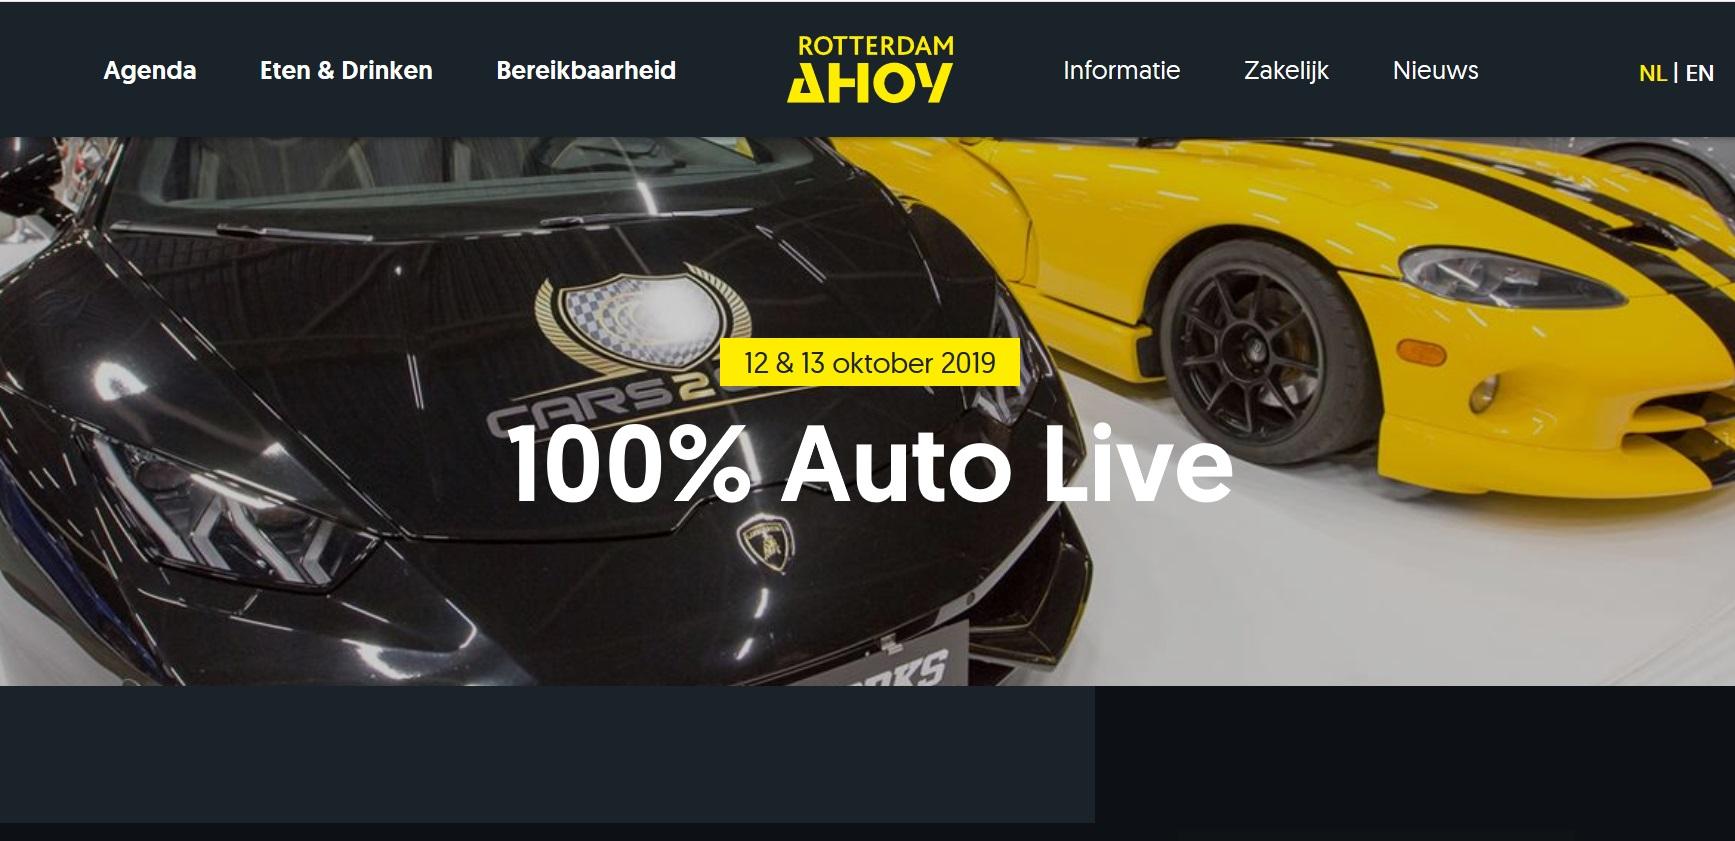 12 oktober 2019 100% Auto Live Ahoy Rotterdam